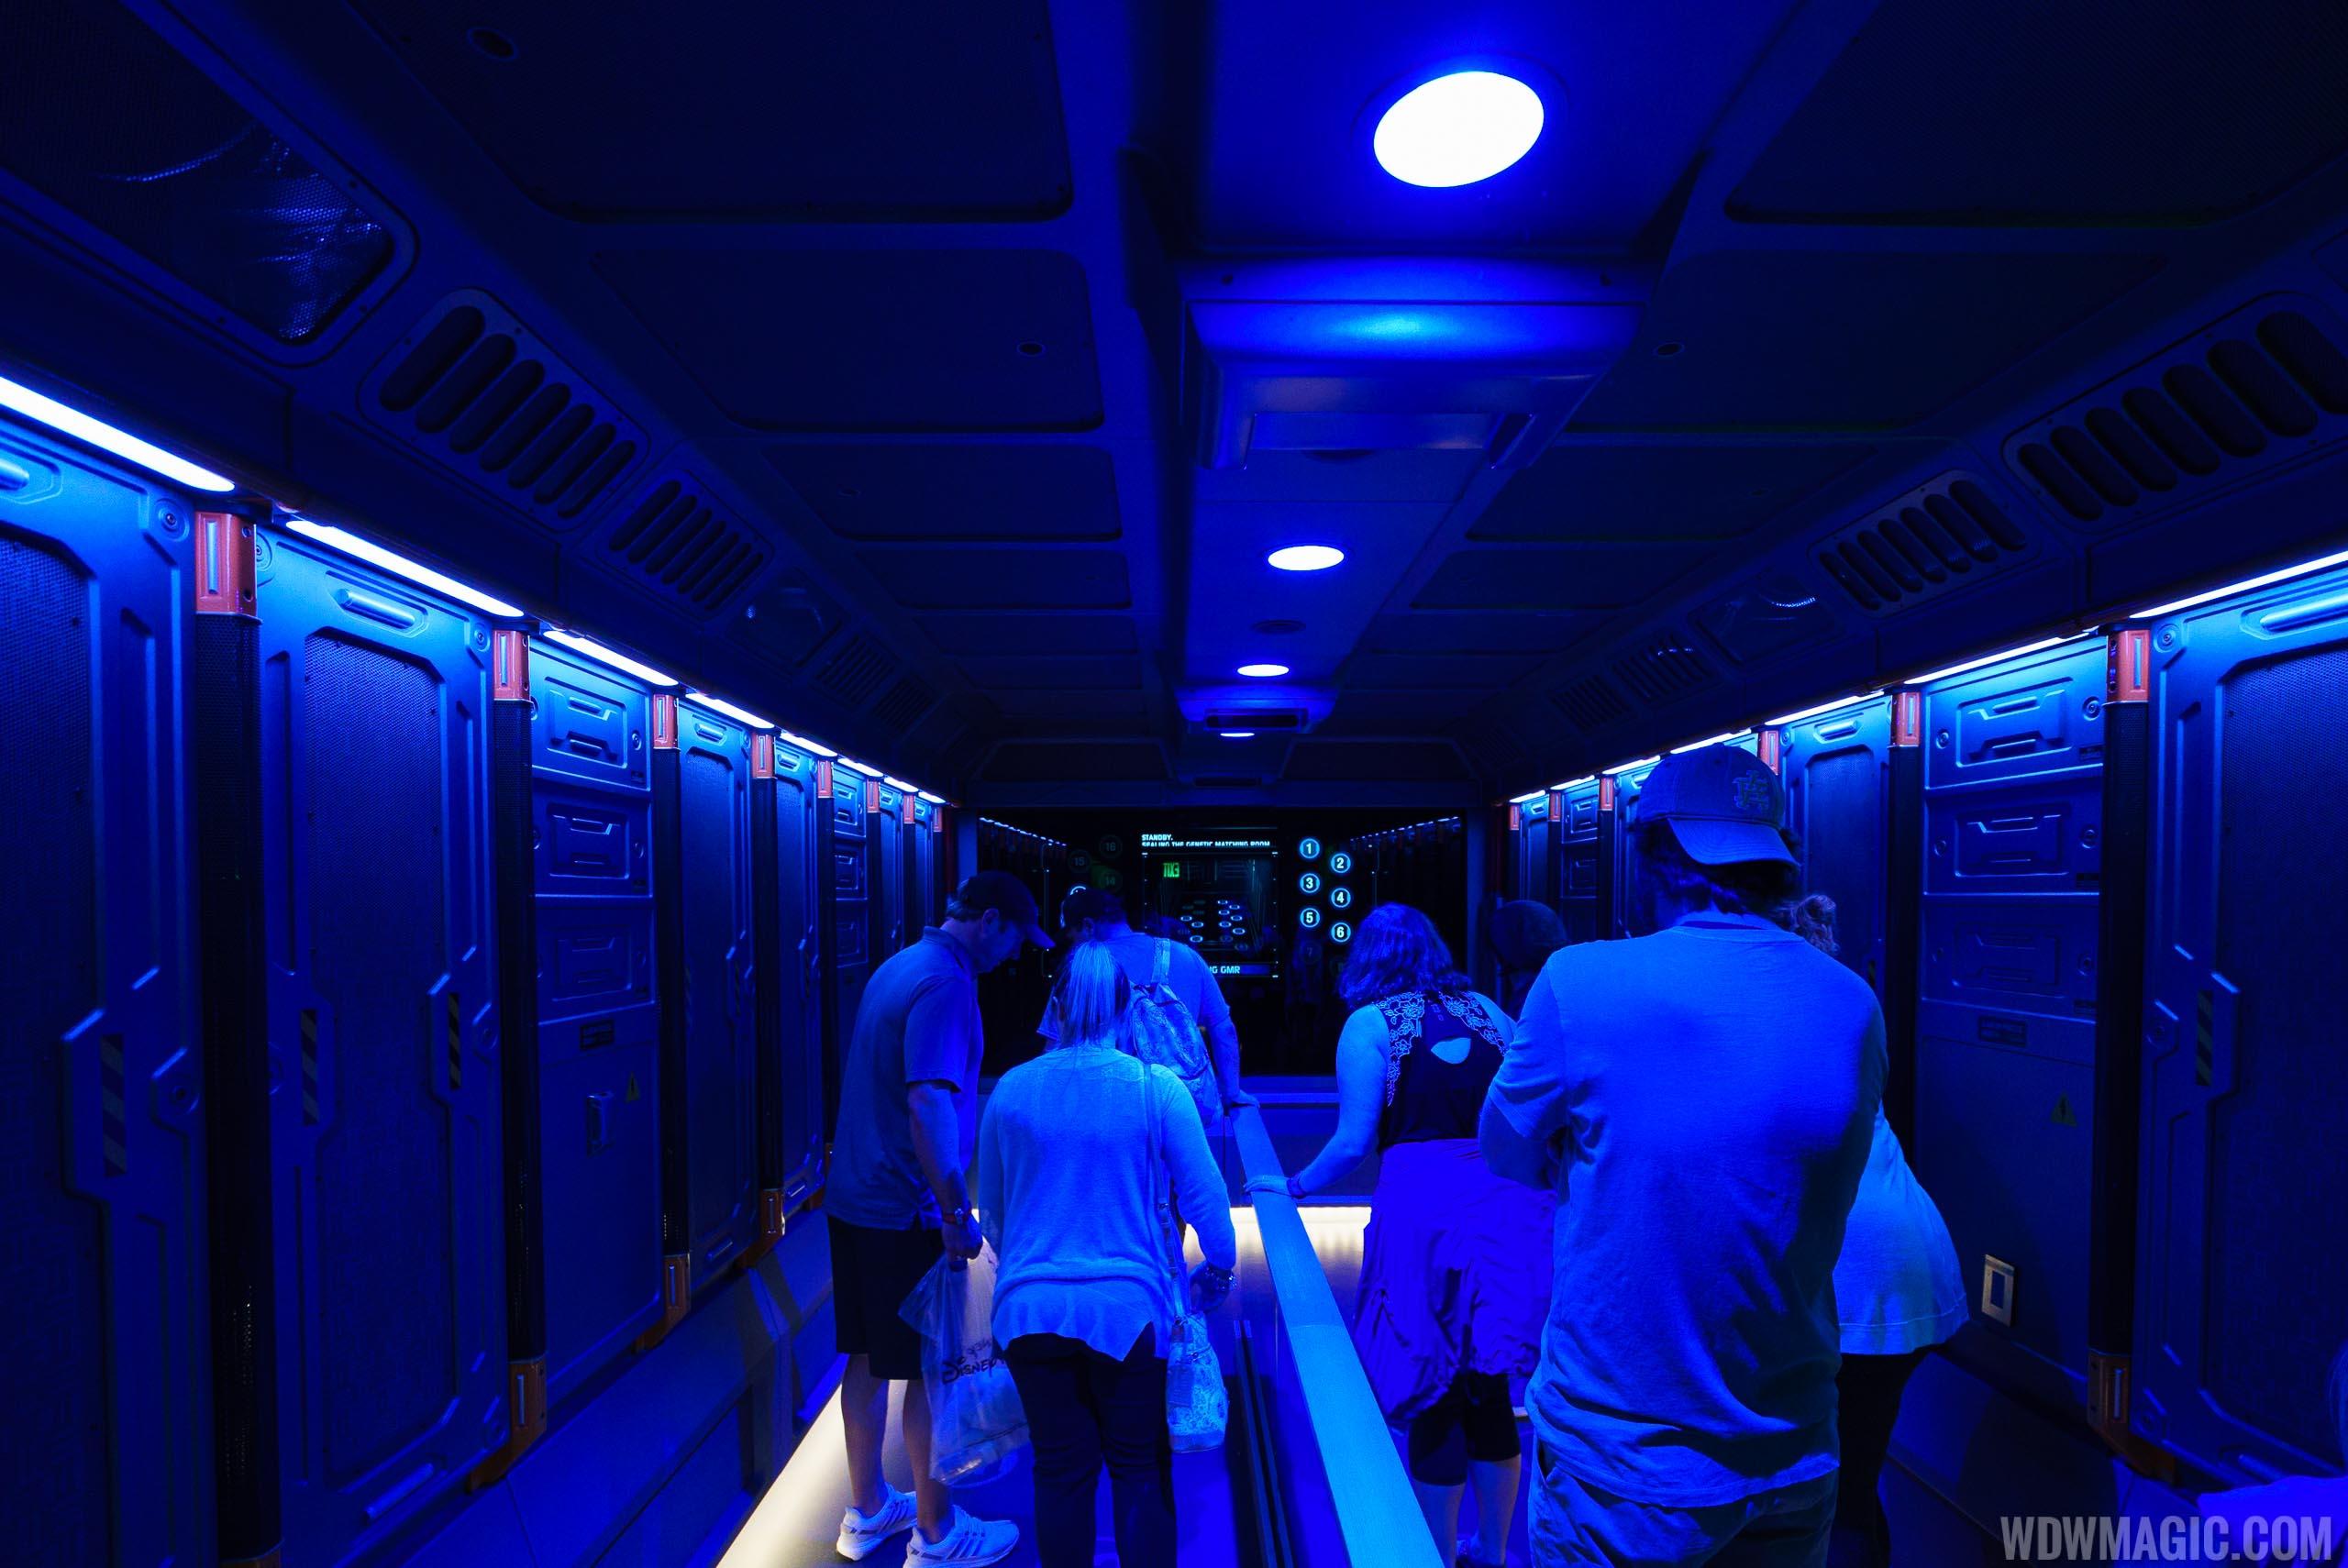 Avatar Flight of Passage queue - Decontamination room